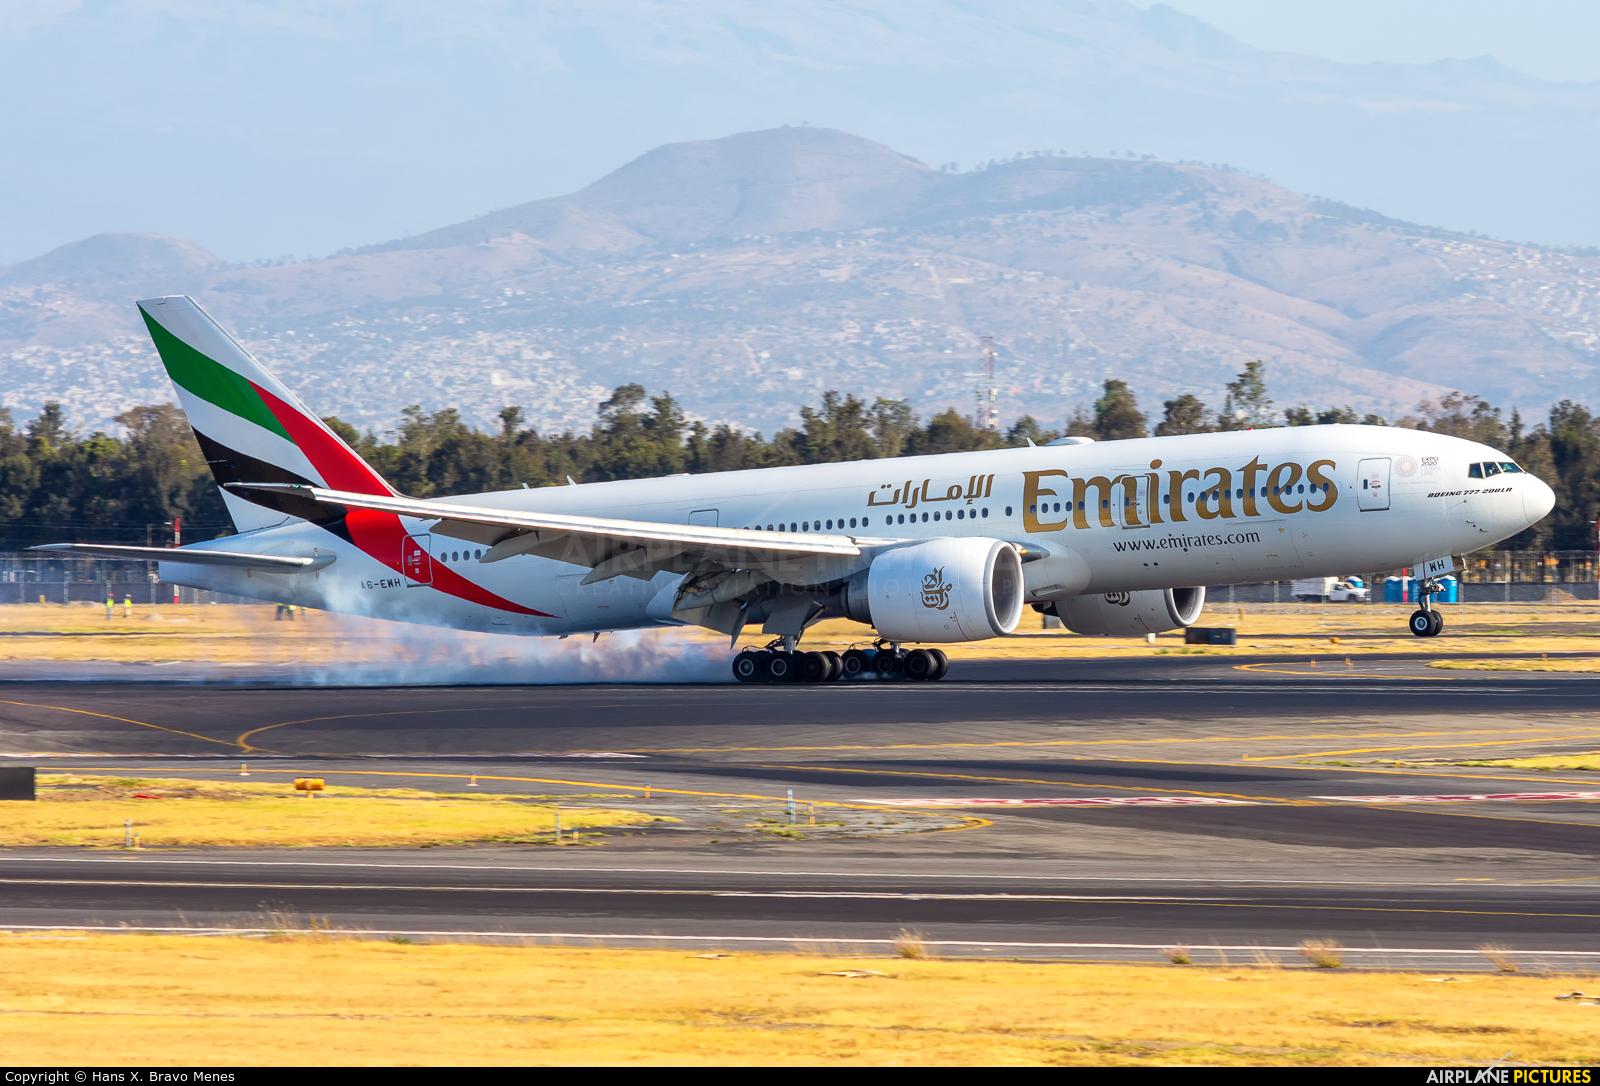 Emirates Airlines A6-EWH aircraft at Mexico City - Licenciado Benito Juarez Intl